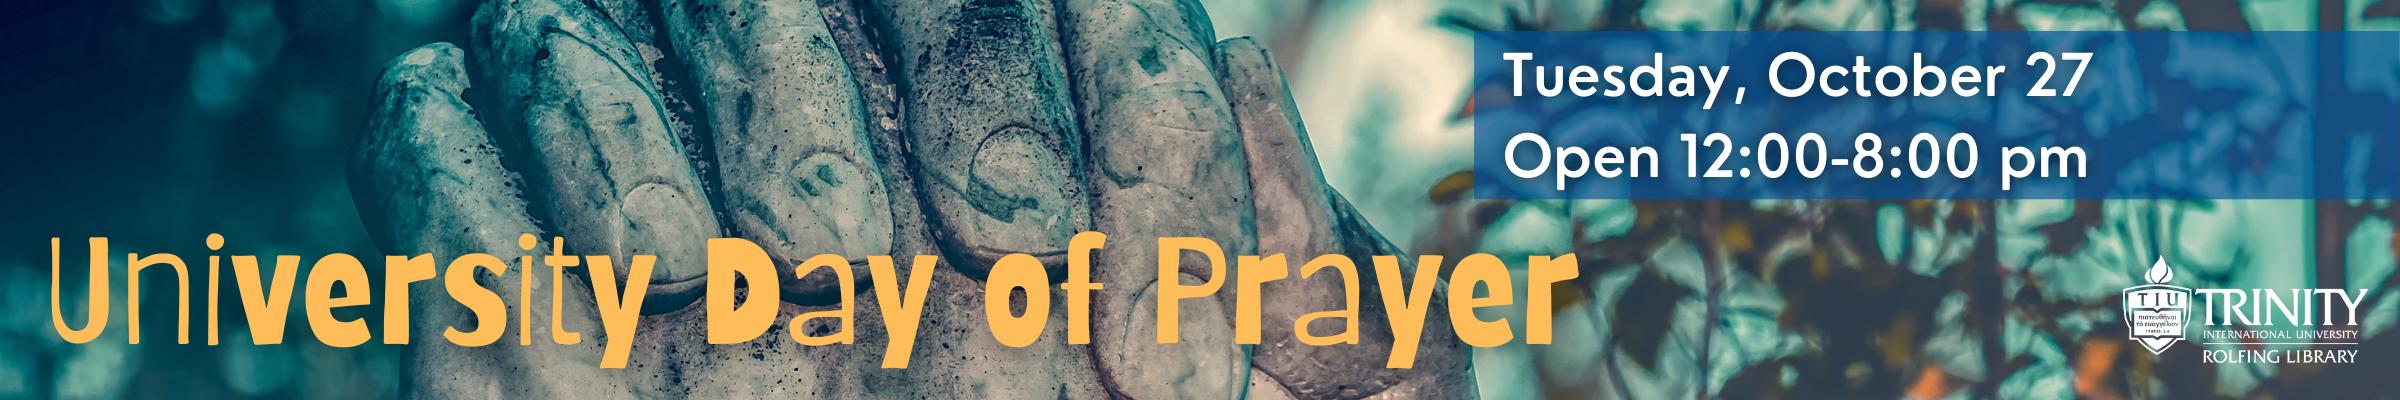 University Day of Prayer - Open 12-8pm October 27